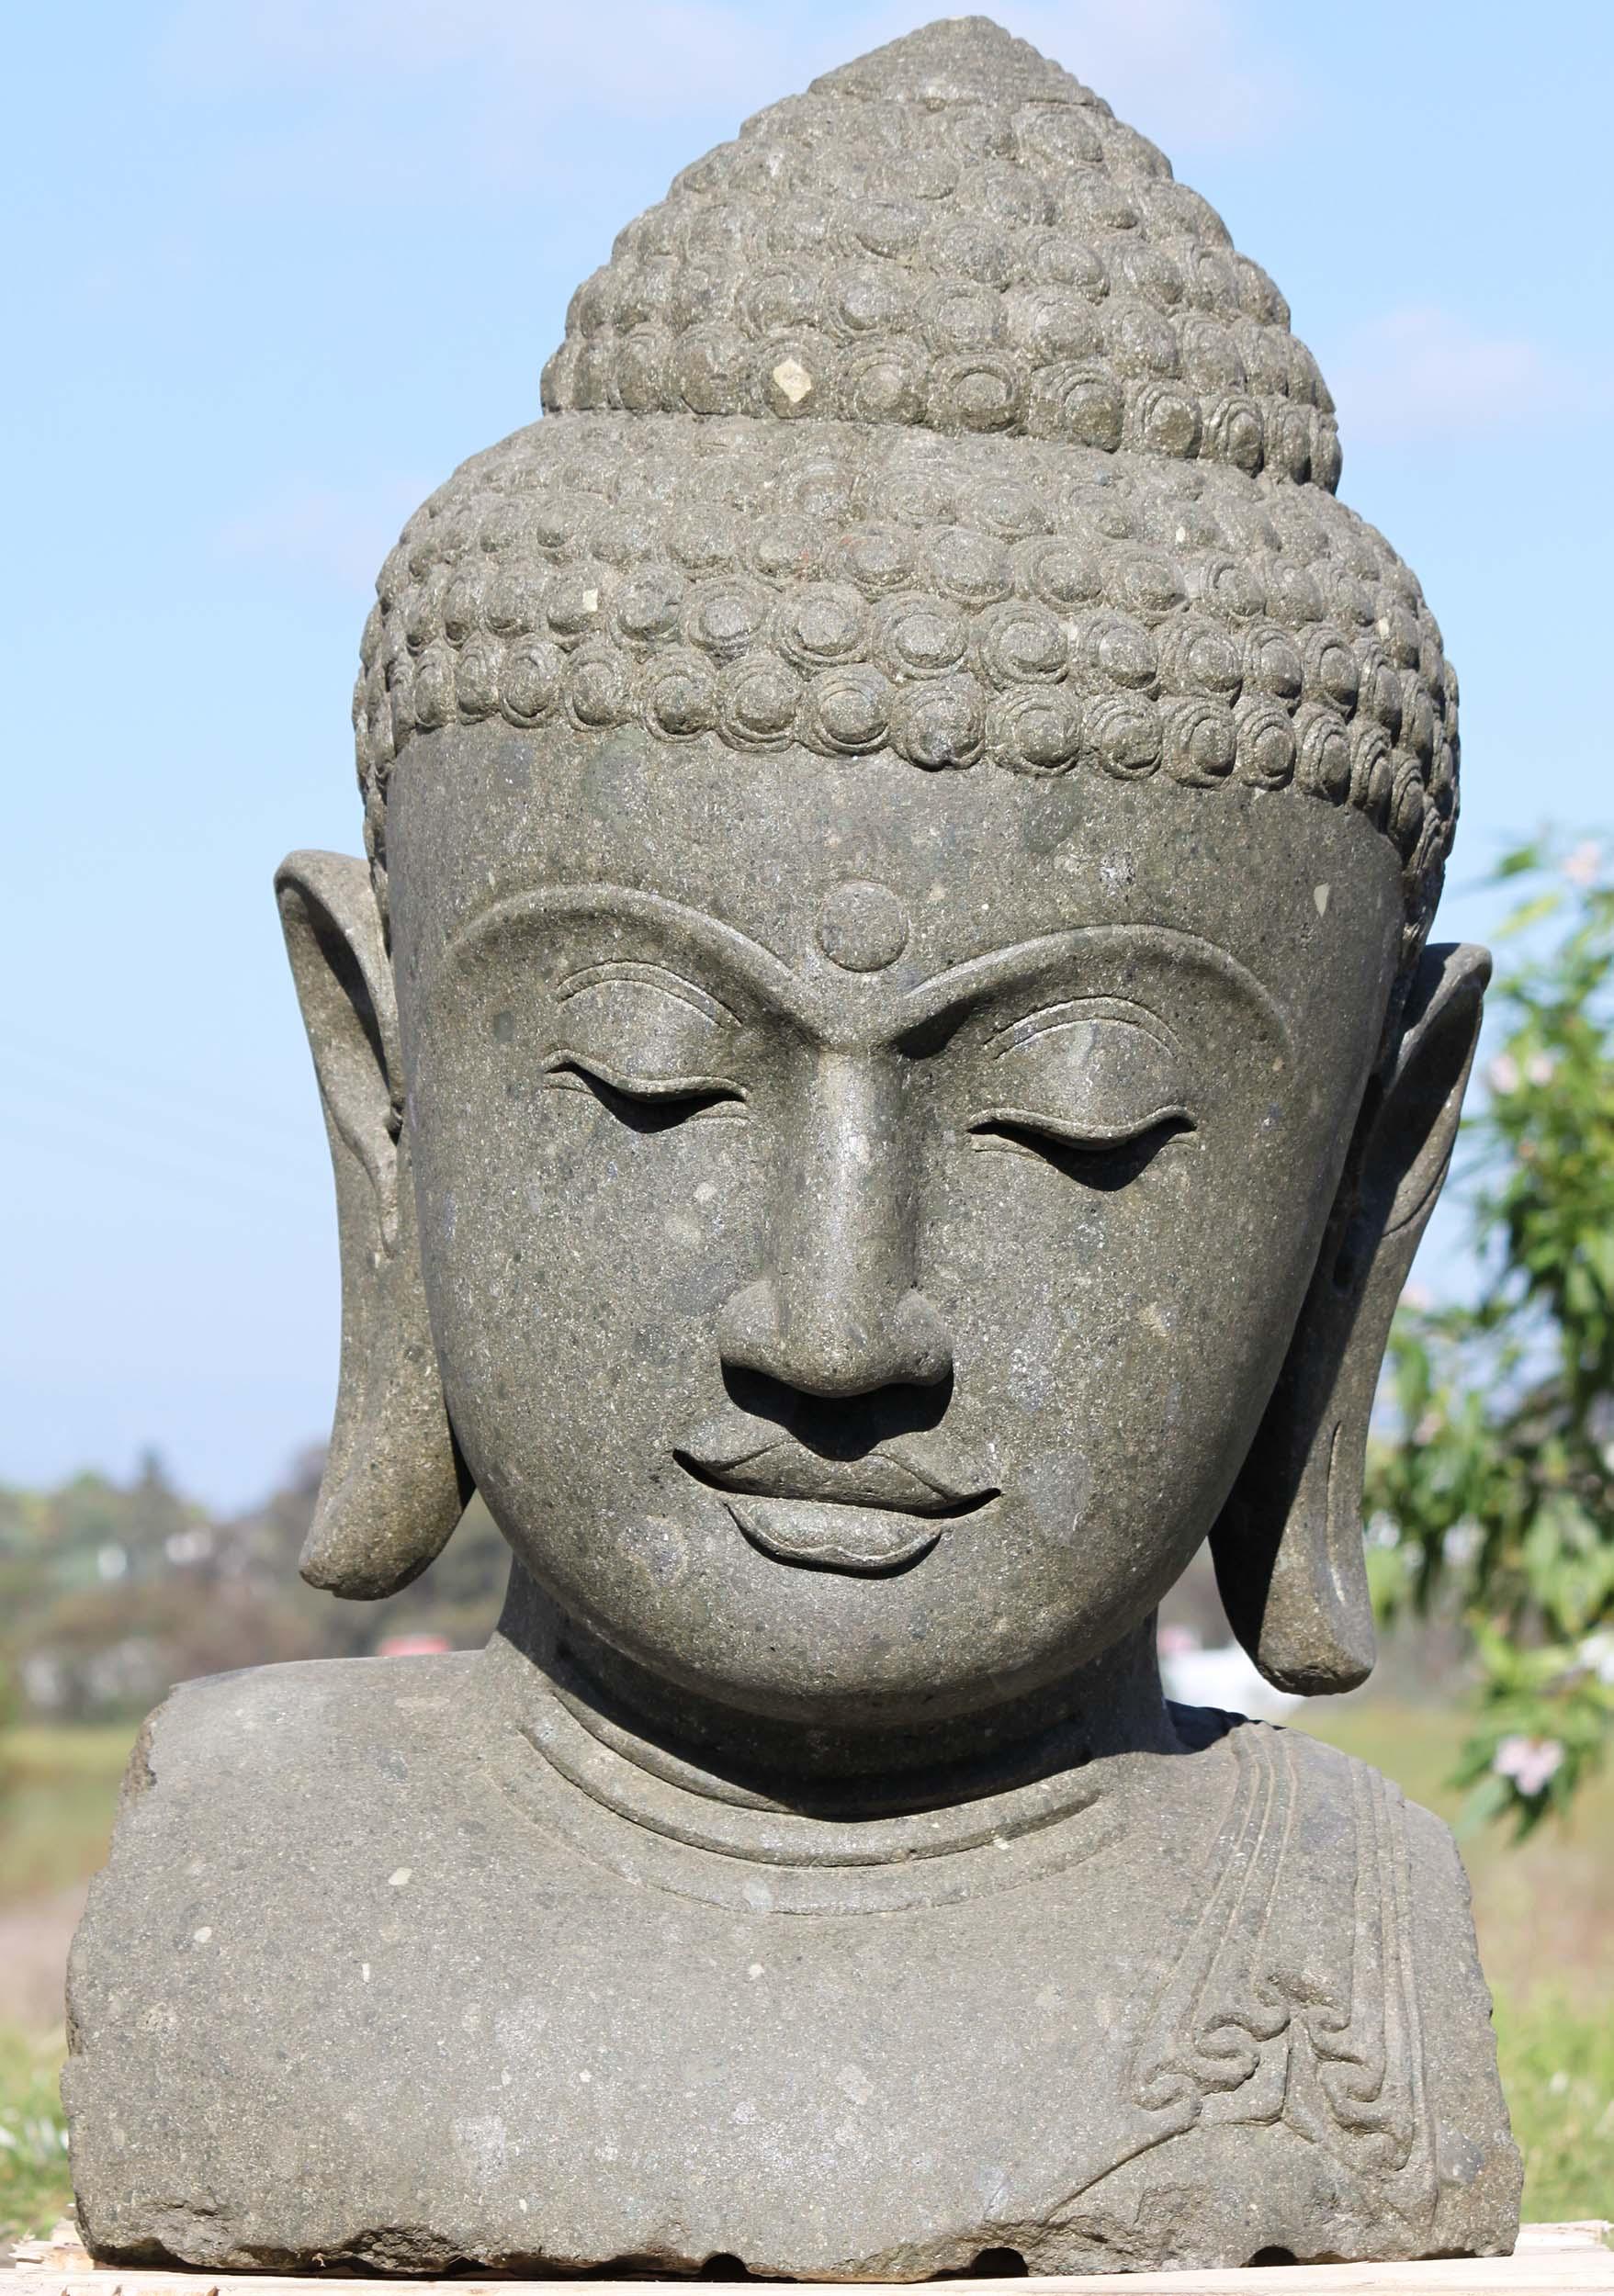 sold large stone rustic garden buddha head 41 102ls413. Black Bedroom Furniture Sets. Home Design Ideas